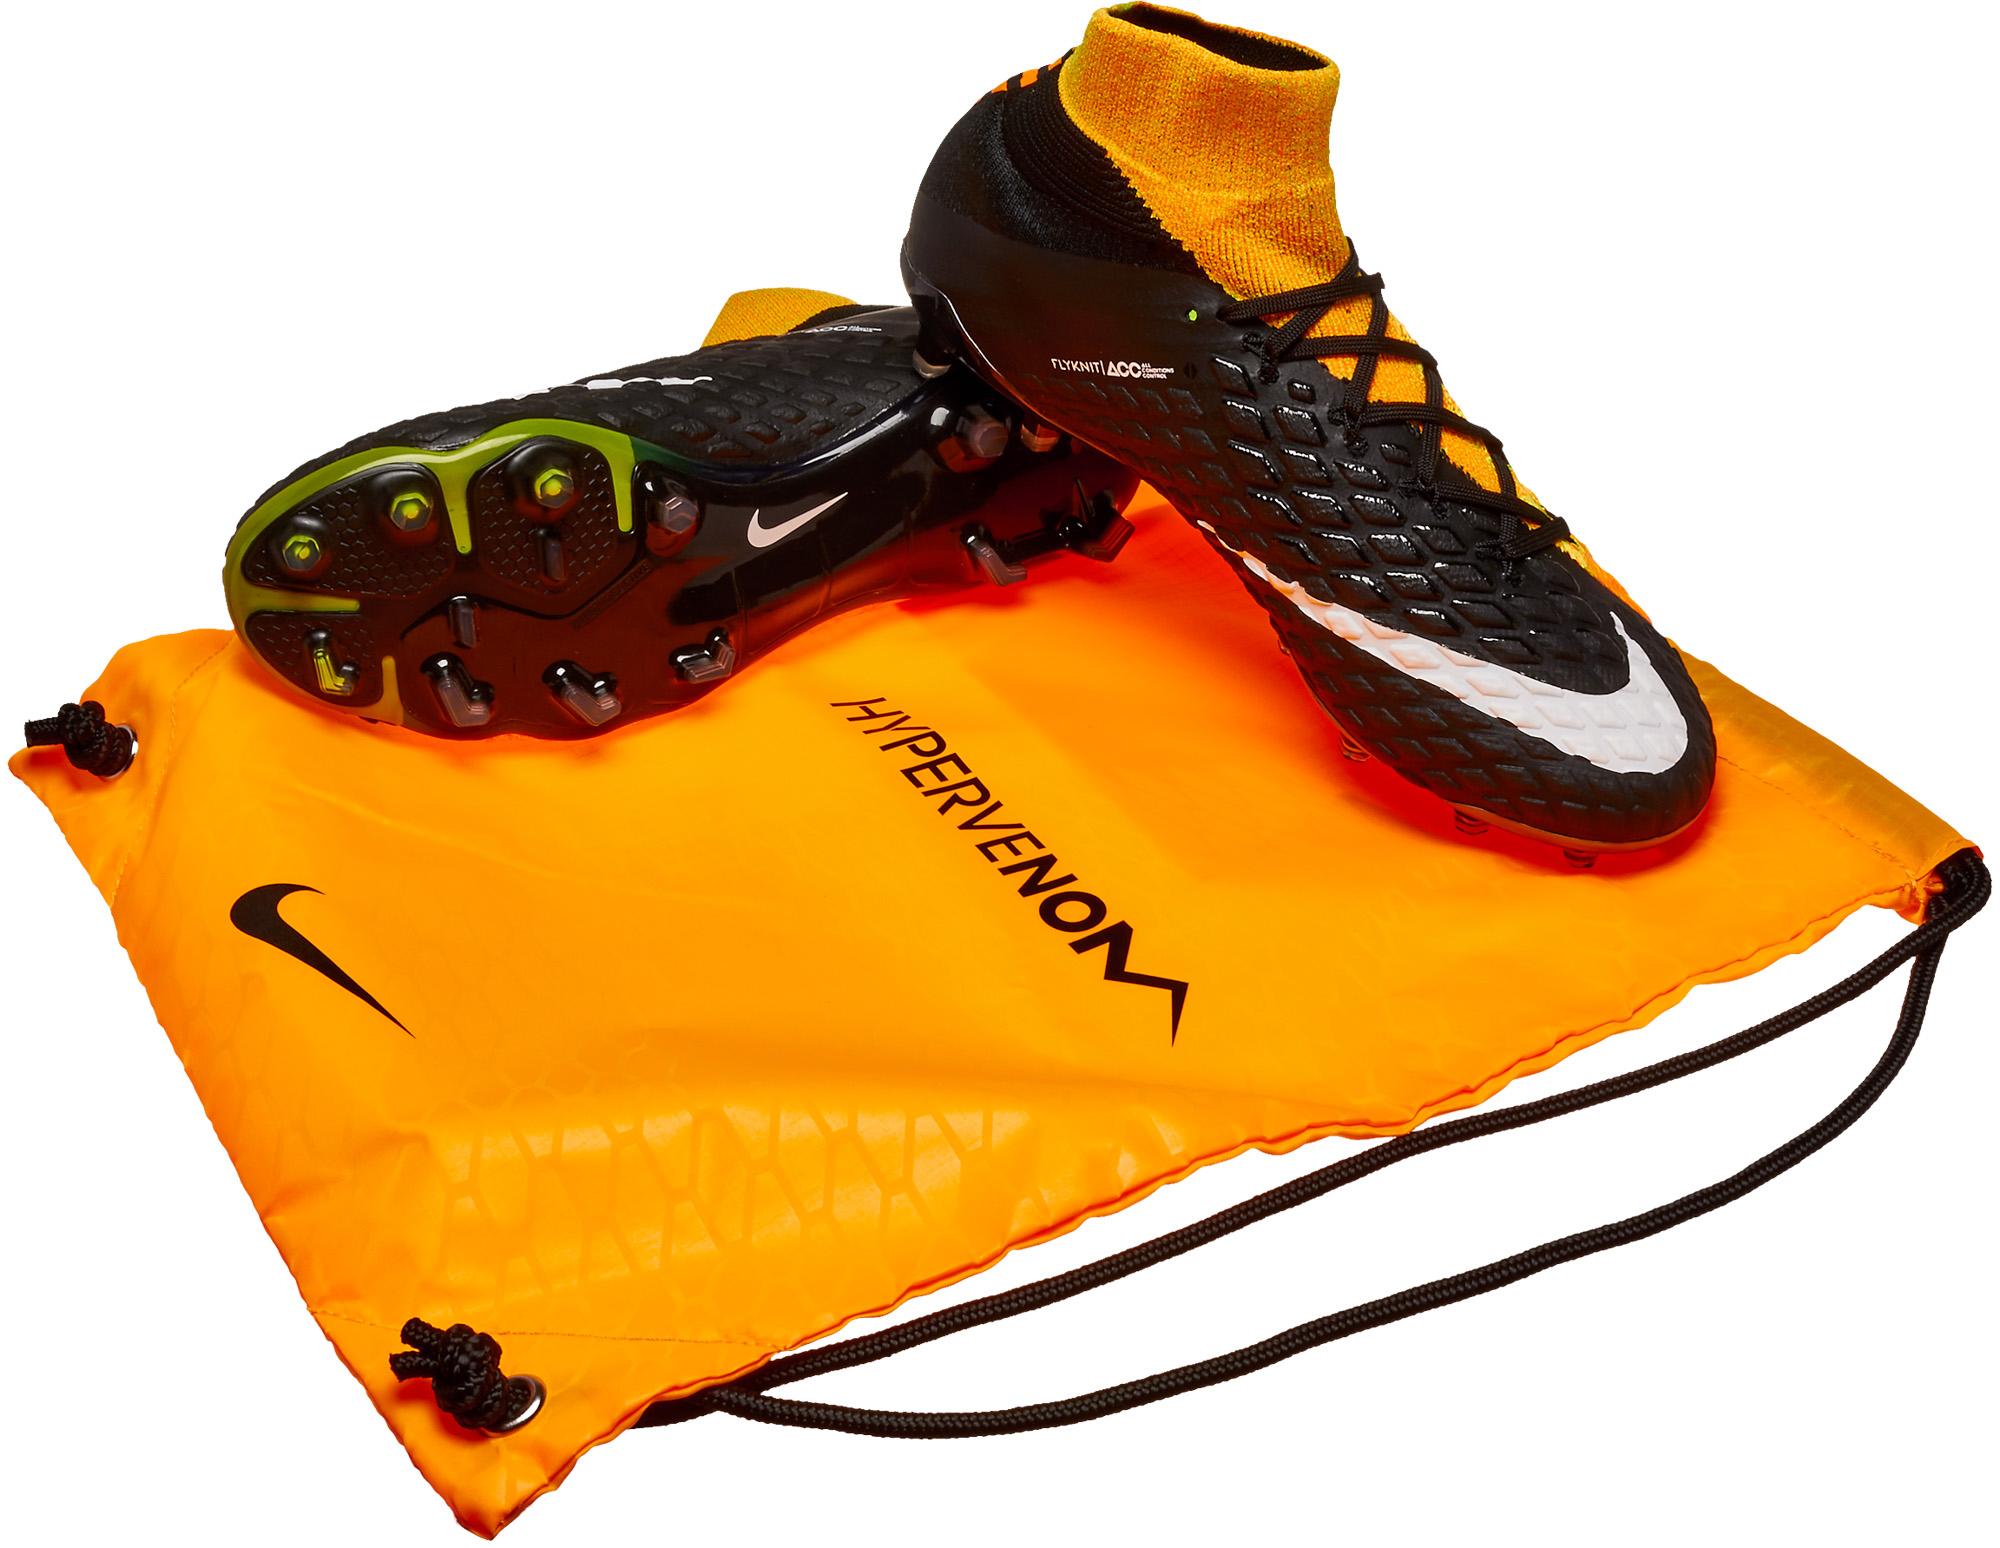 separation shoes 05762 89f41 Nike Hypervenom Phantom III DF FG - Laser Orange & Black ...